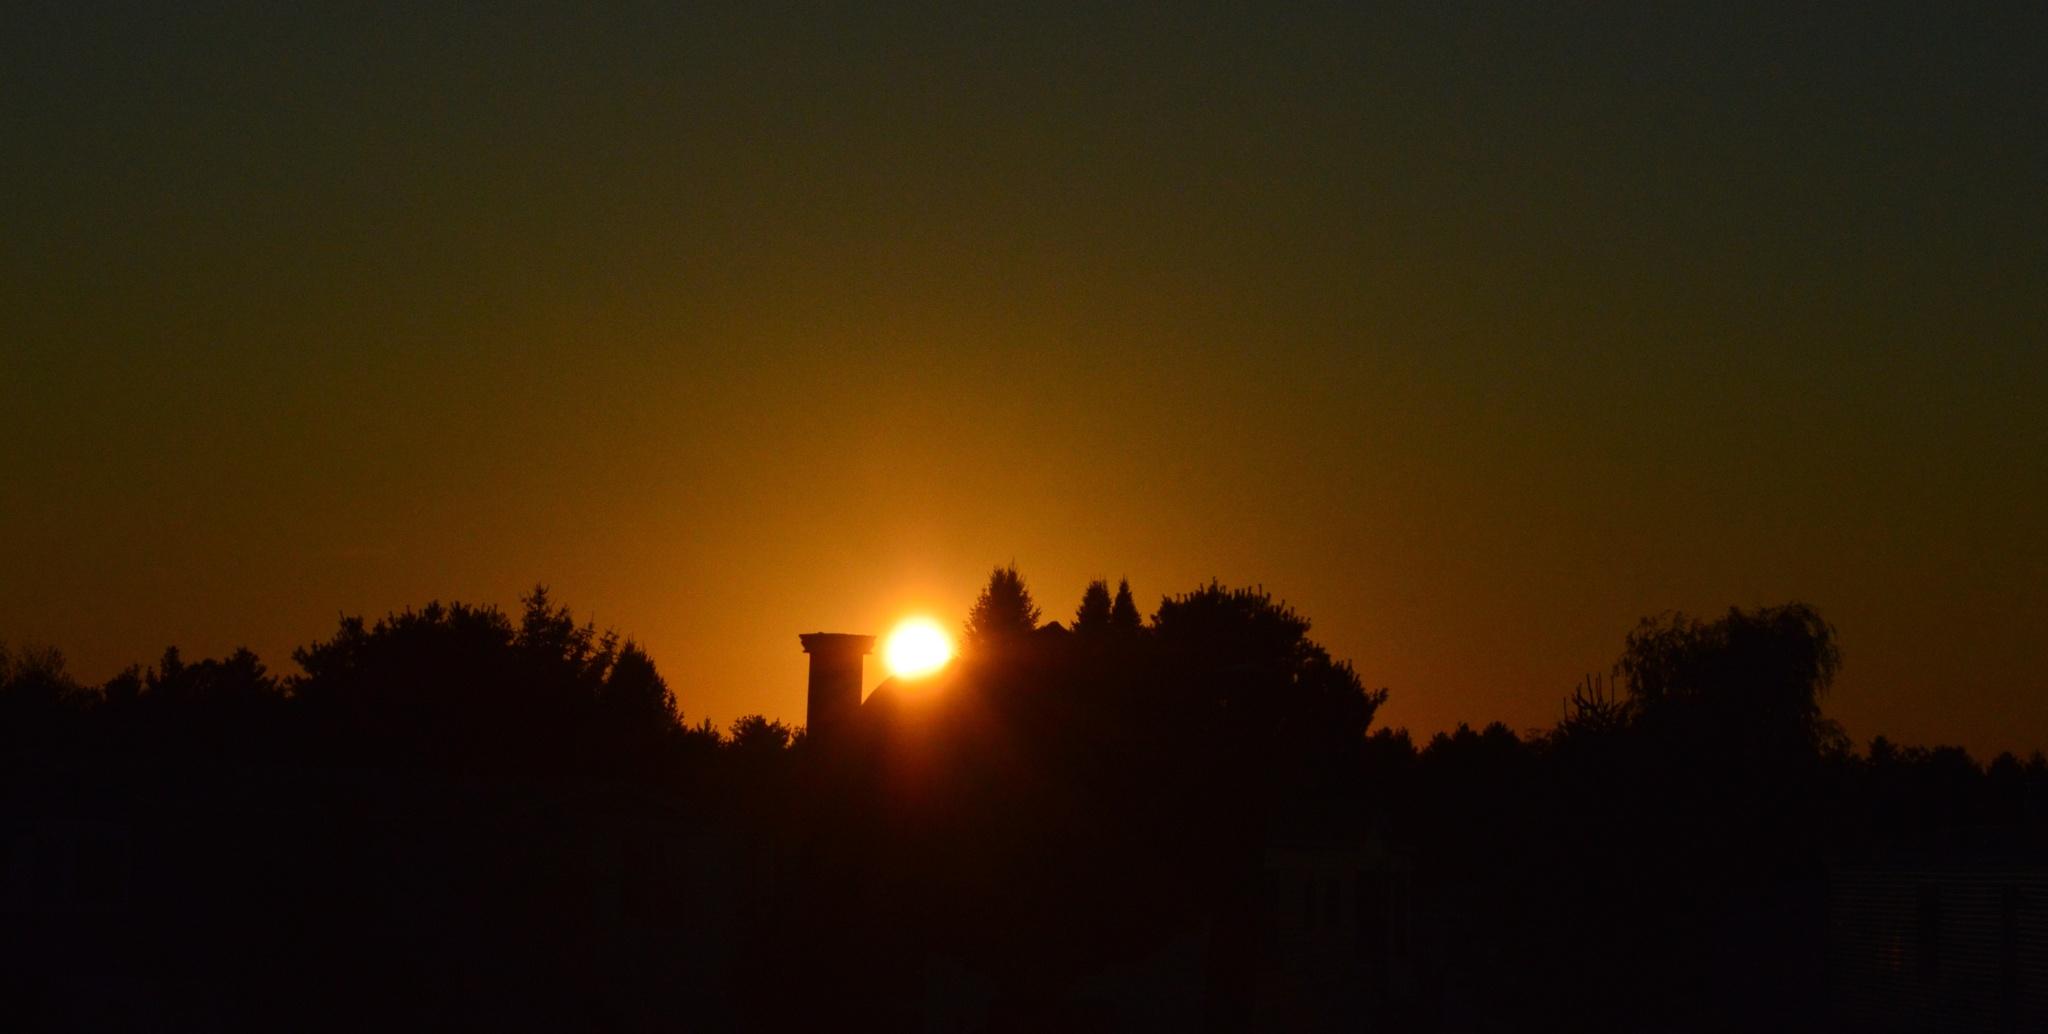 A Maine Sunset ~ Sept 5, 2015 by Emeraress